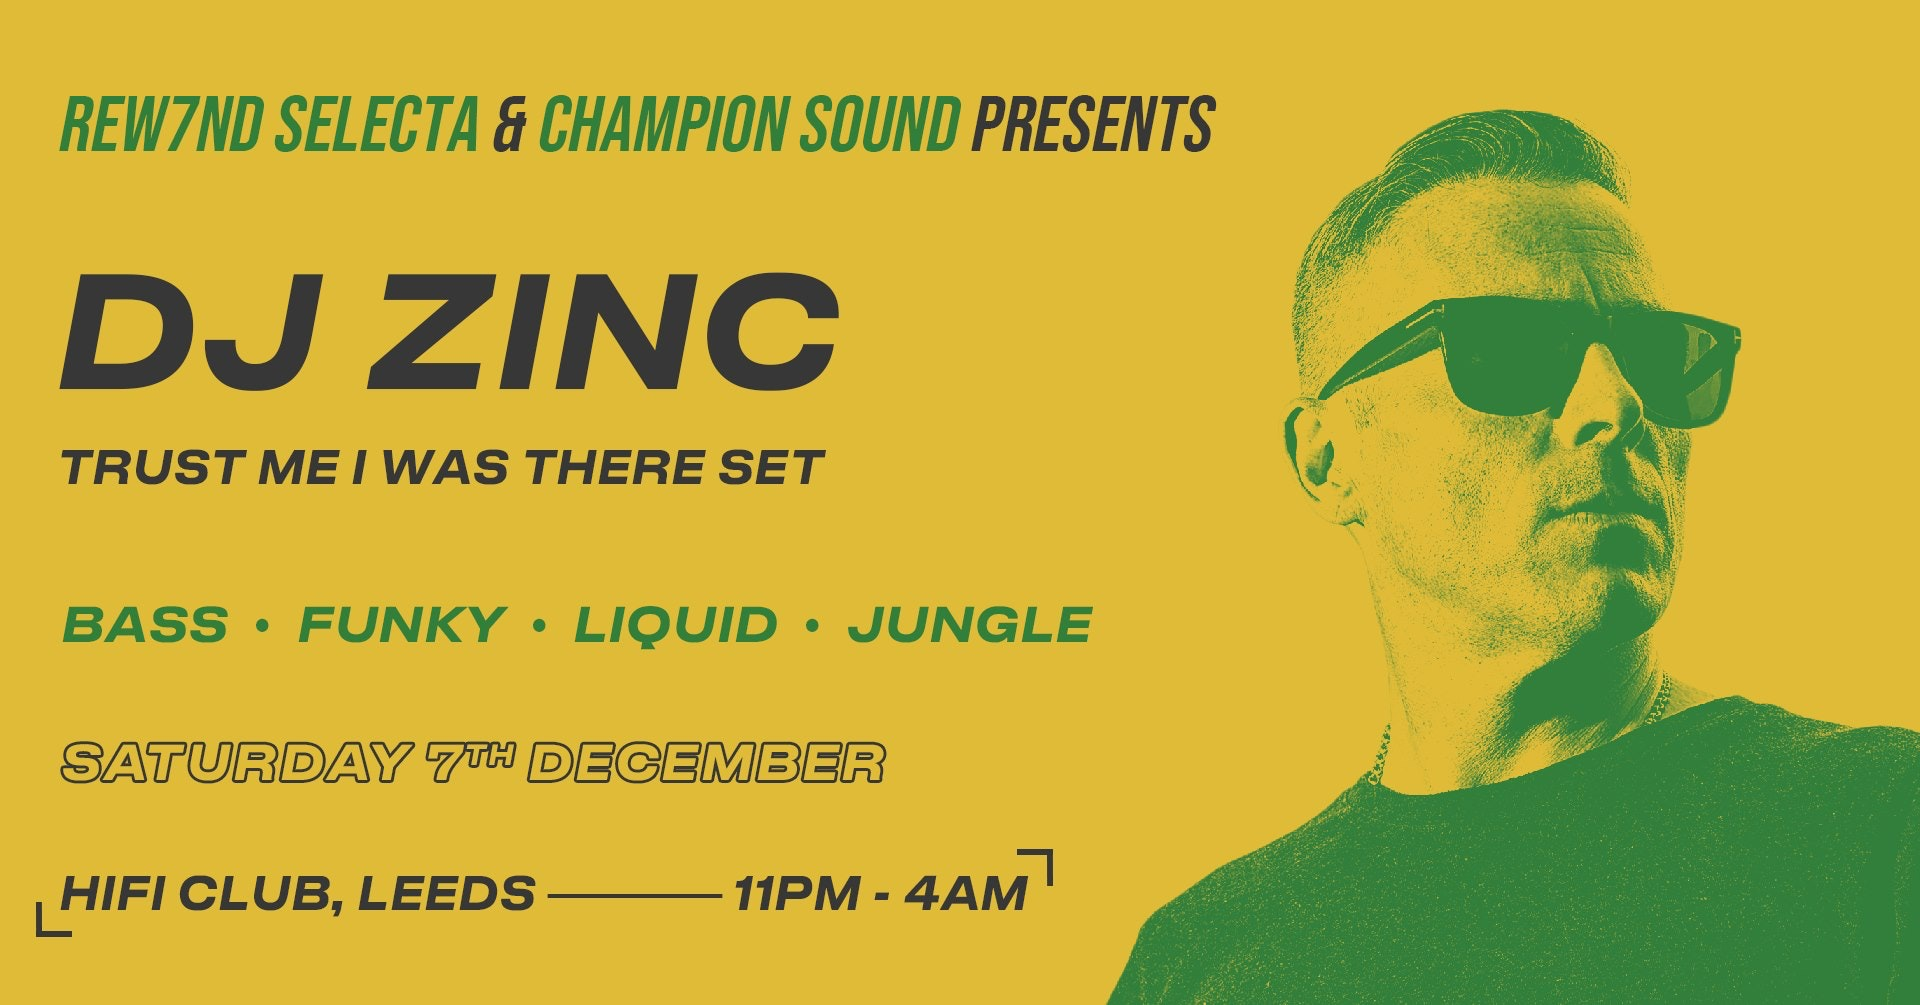 DJ Zinc x Rew7nd Selecta x Champion Sound